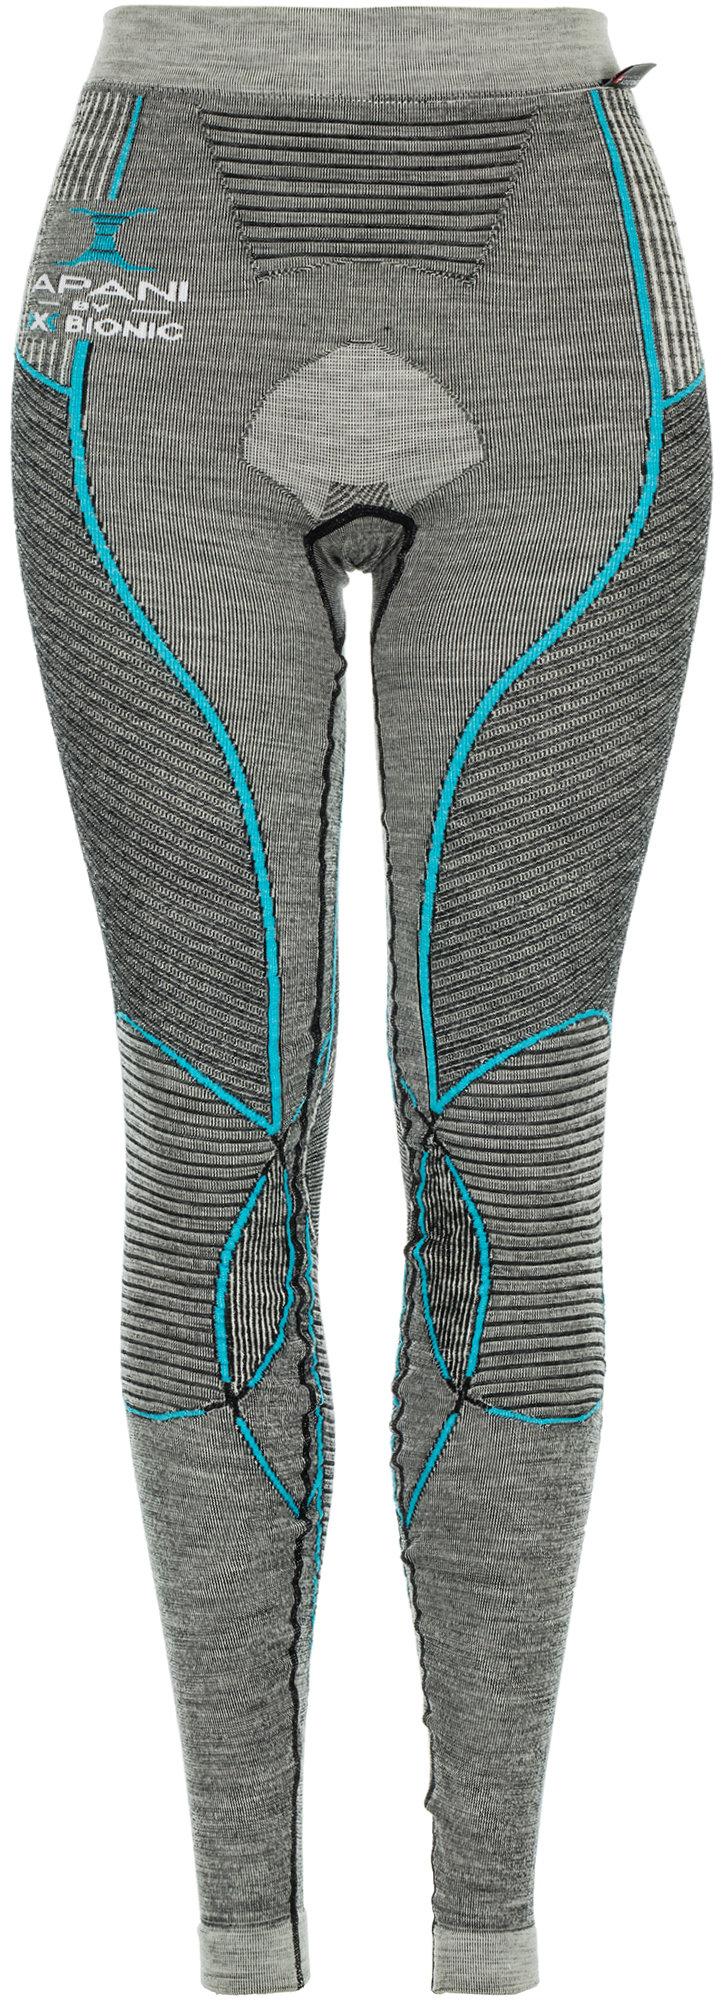 Кальсоны женские X-Bionic Apani Merino, размер 48-50